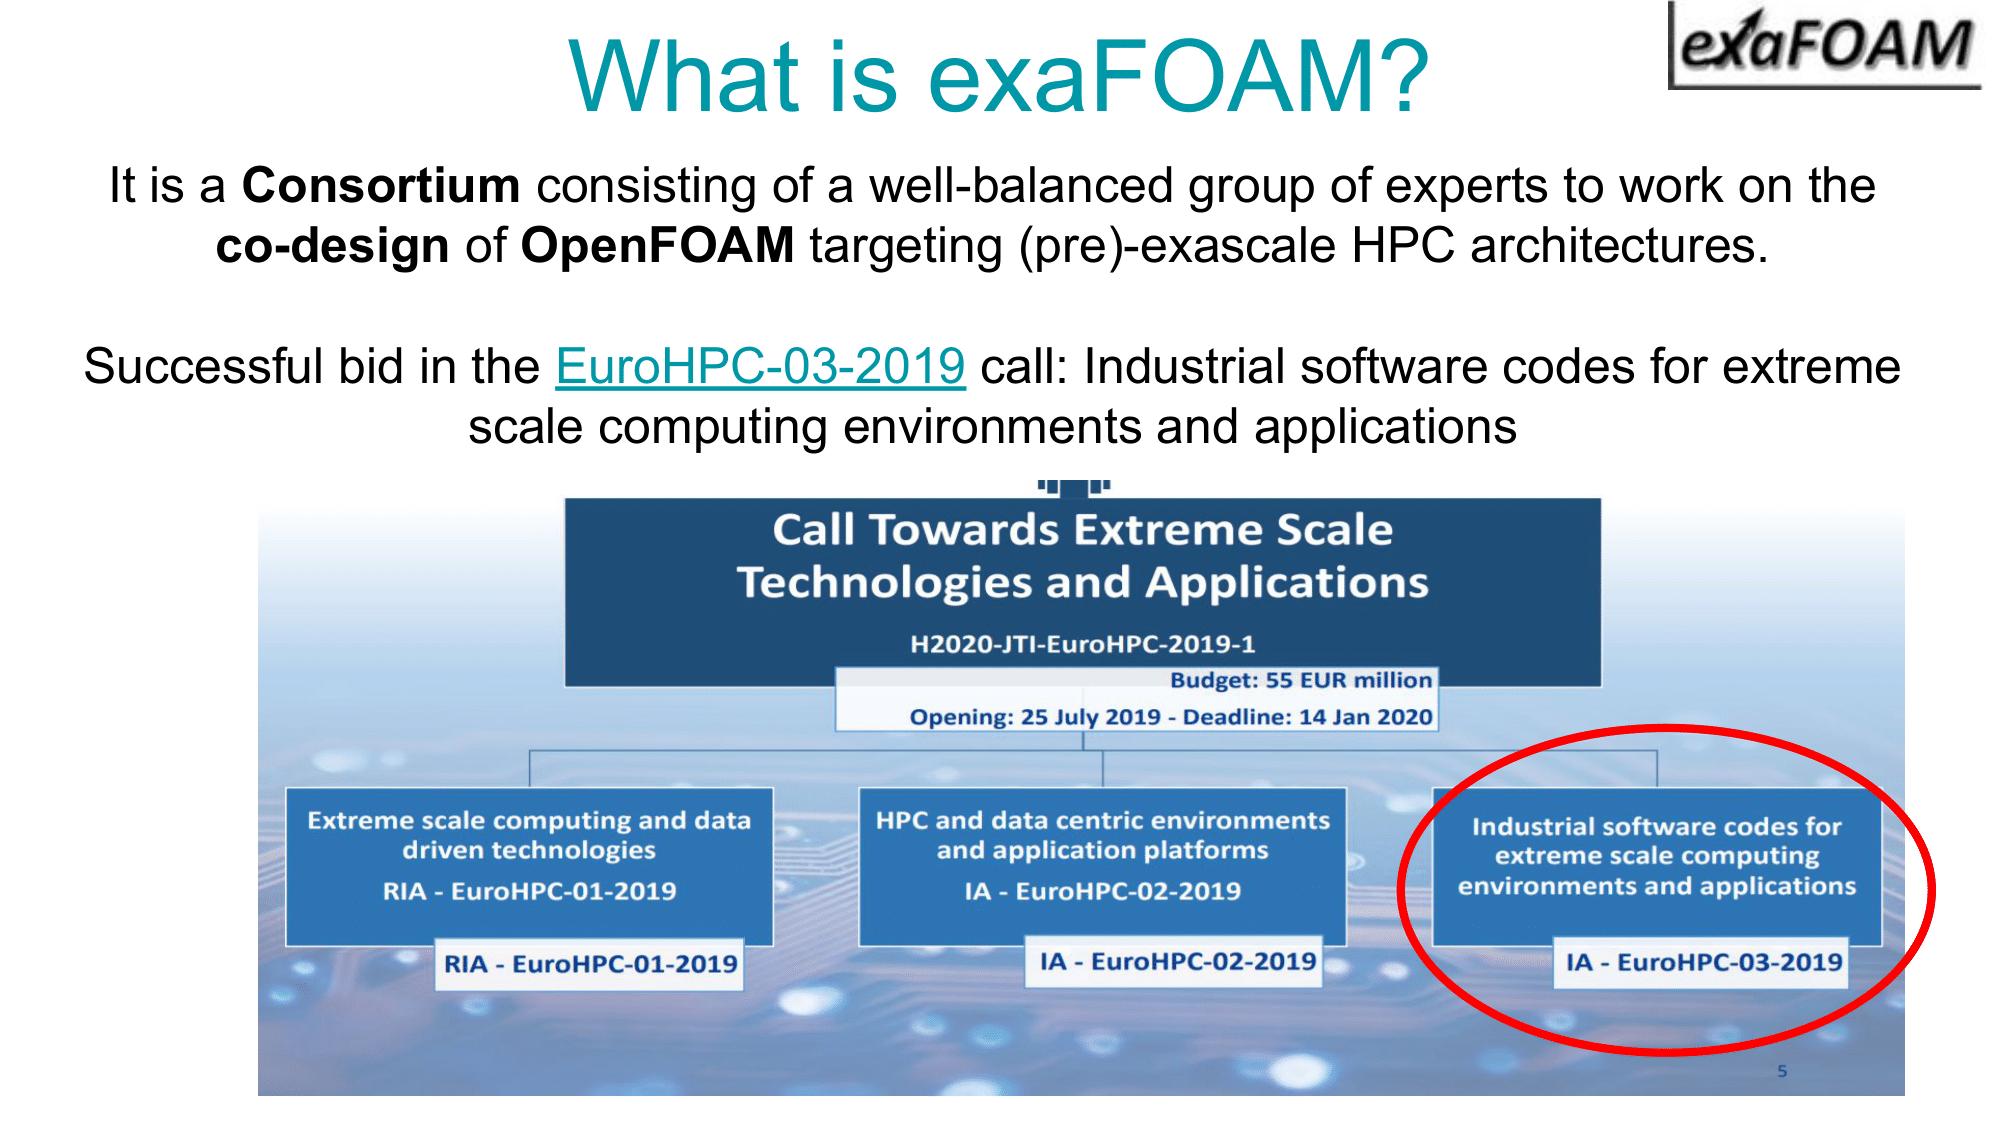 exaFOAM_at_glance-1